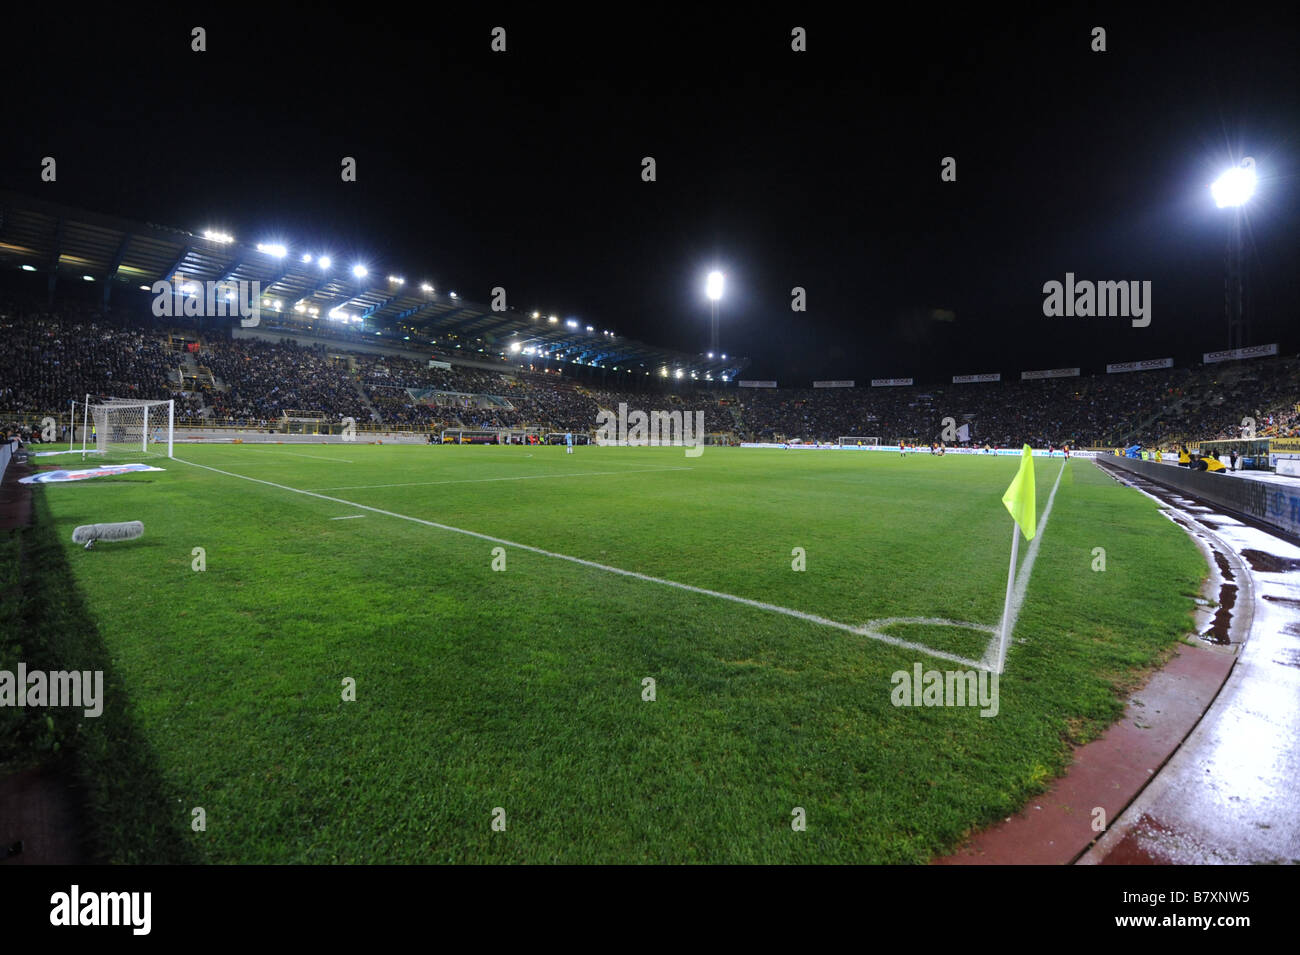 General view OCTOBER 29 2008 Football Italian Serie A match between Bologna and Juventus at Renato Dall ara Stadium - Stock Image